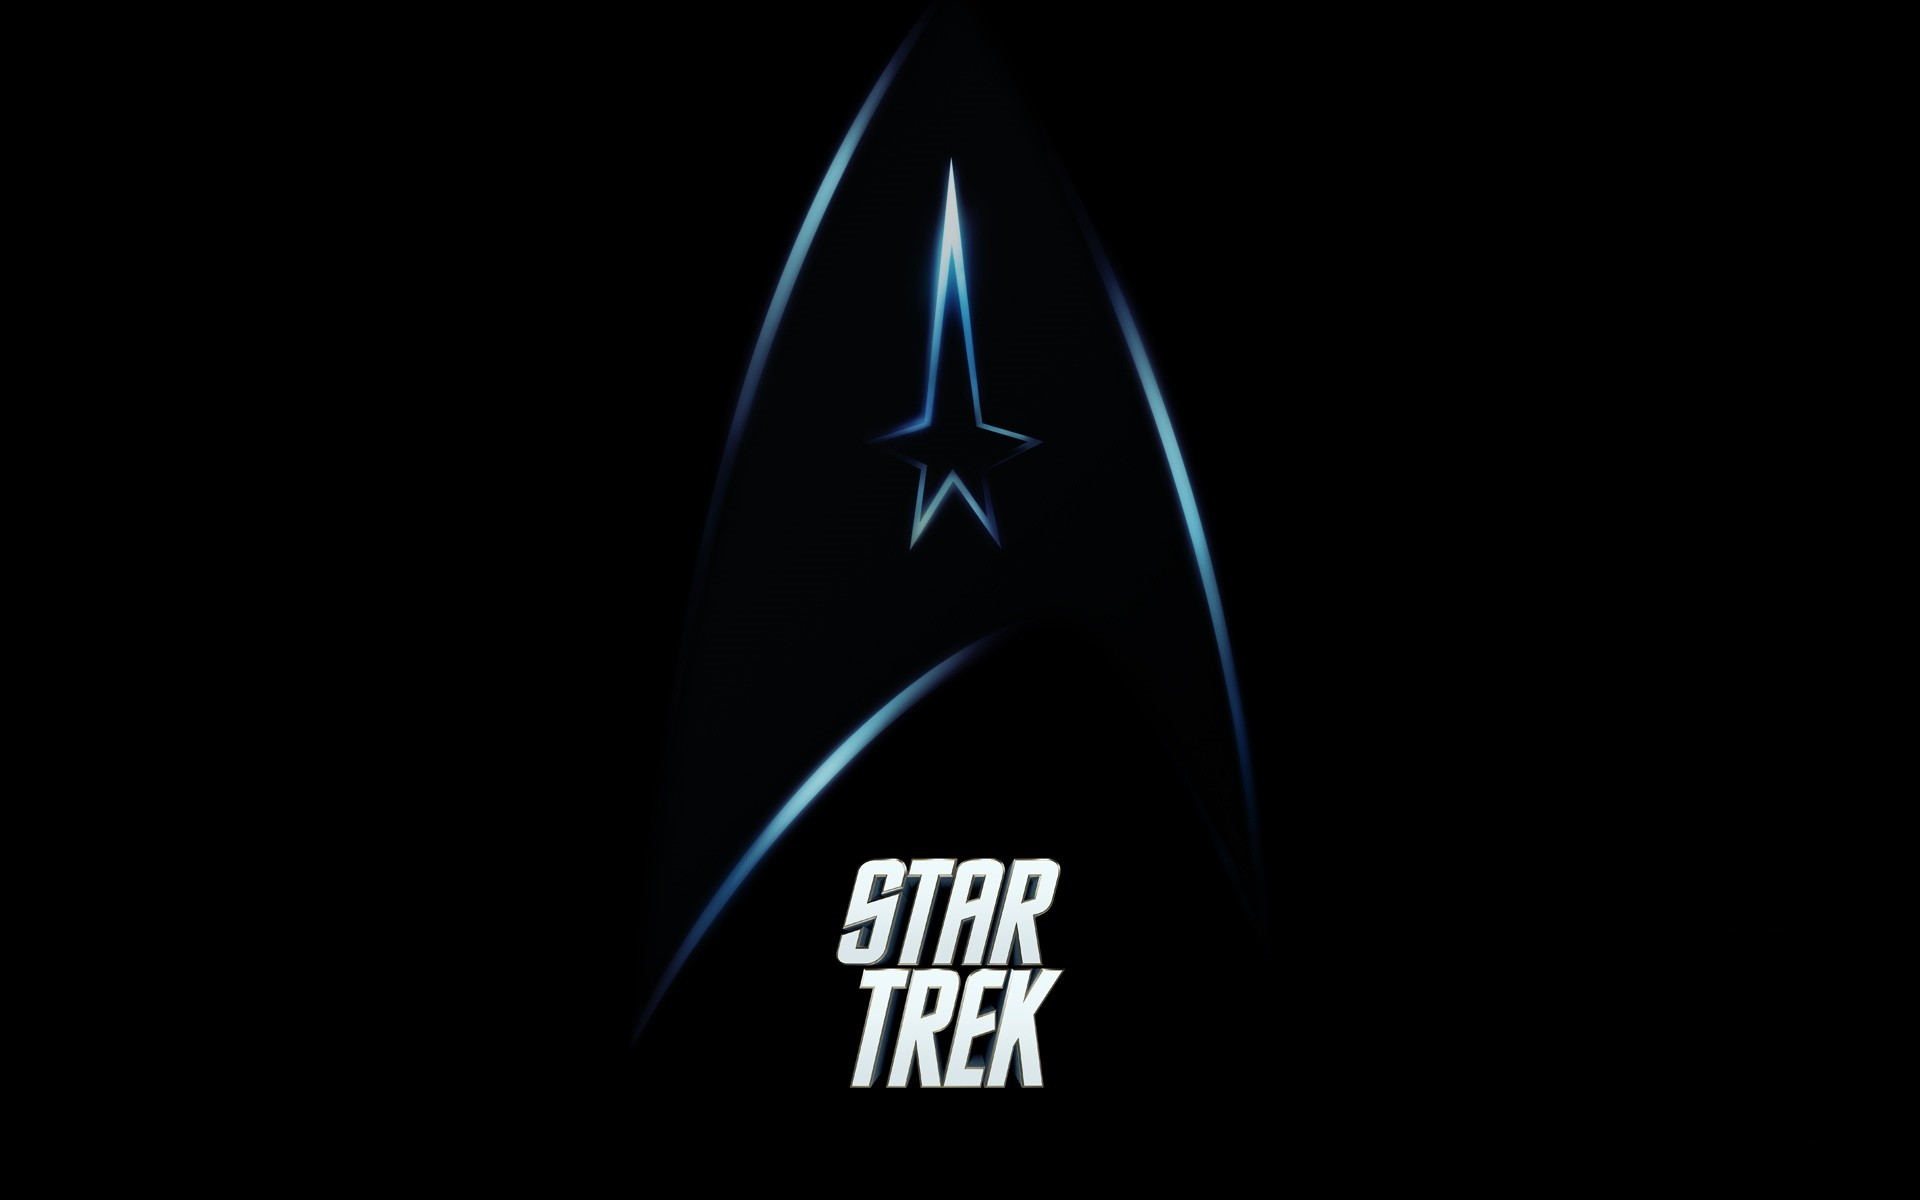 Star trek movie anime logo HD wallpapers.